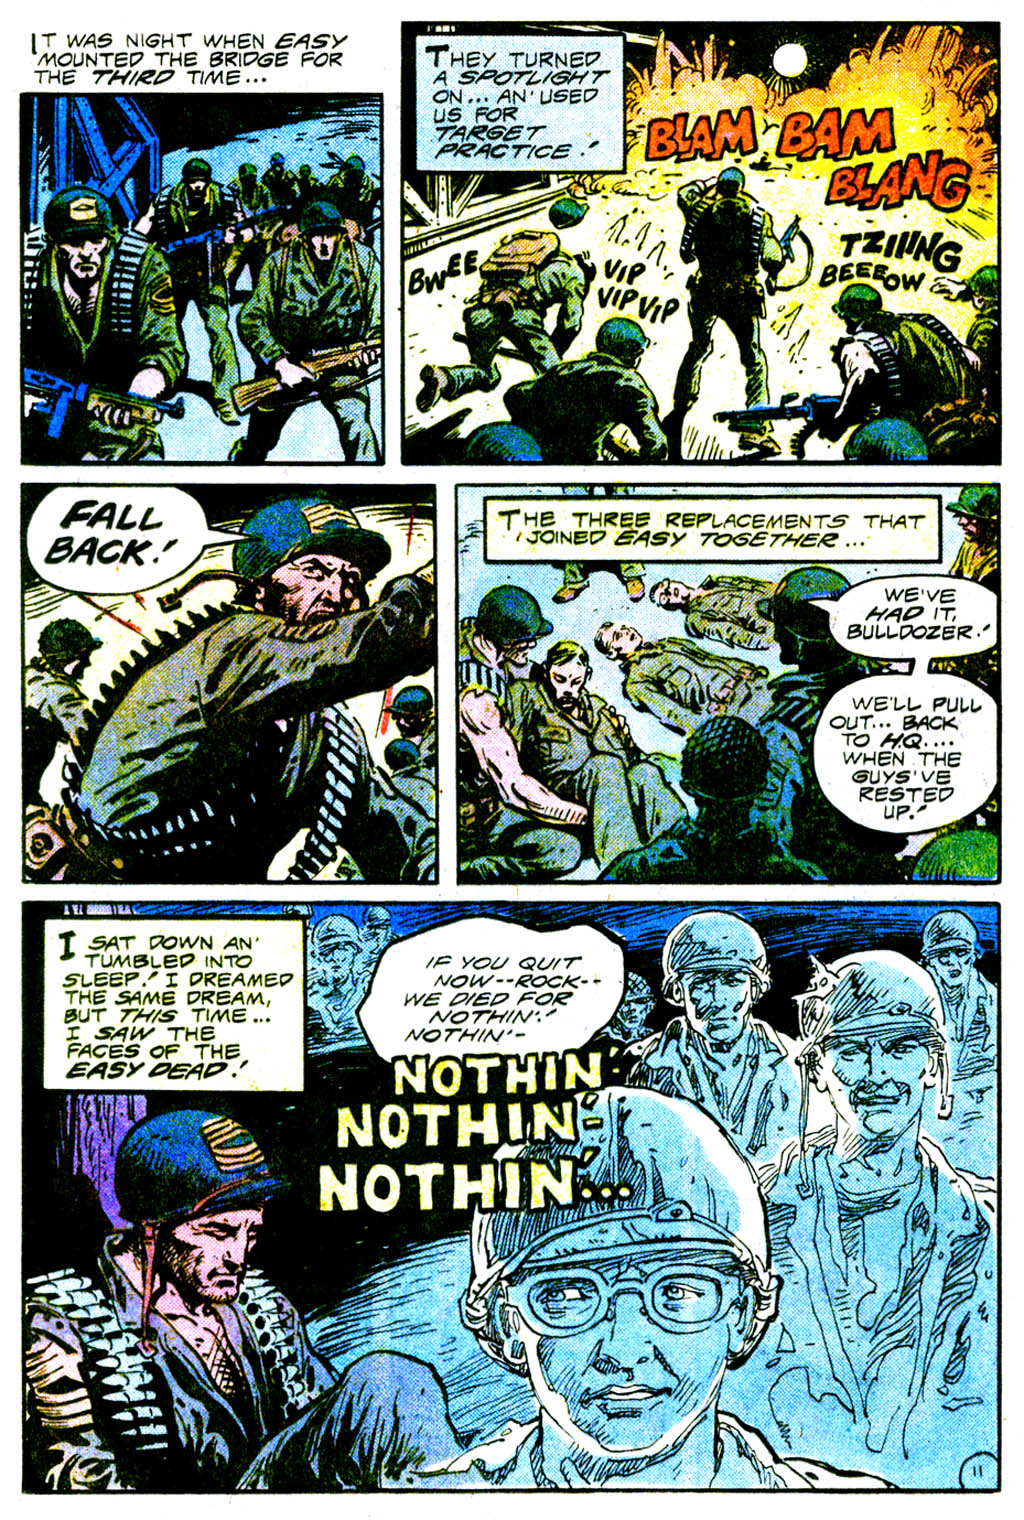 Read online Sgt. Rock comic -  Issue #375 - 15